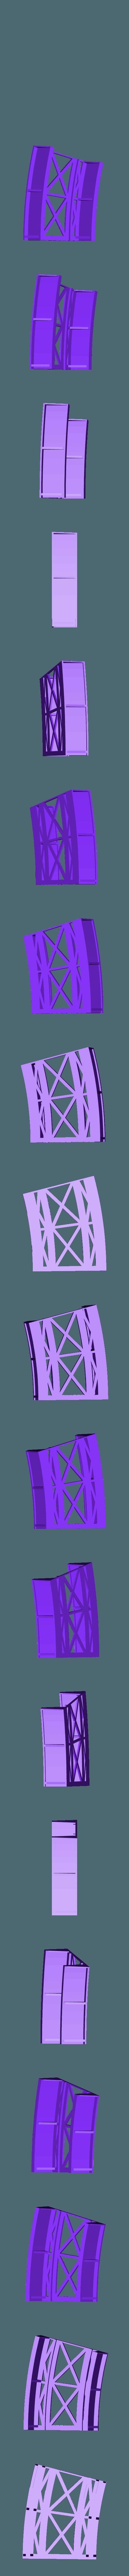 LH_Section_360mm_15R_Bridge_for_Marklin_24130.stl Download free STL file HO Scale Curved Bridge for Marklin Track • 3D printable model, kabrumble